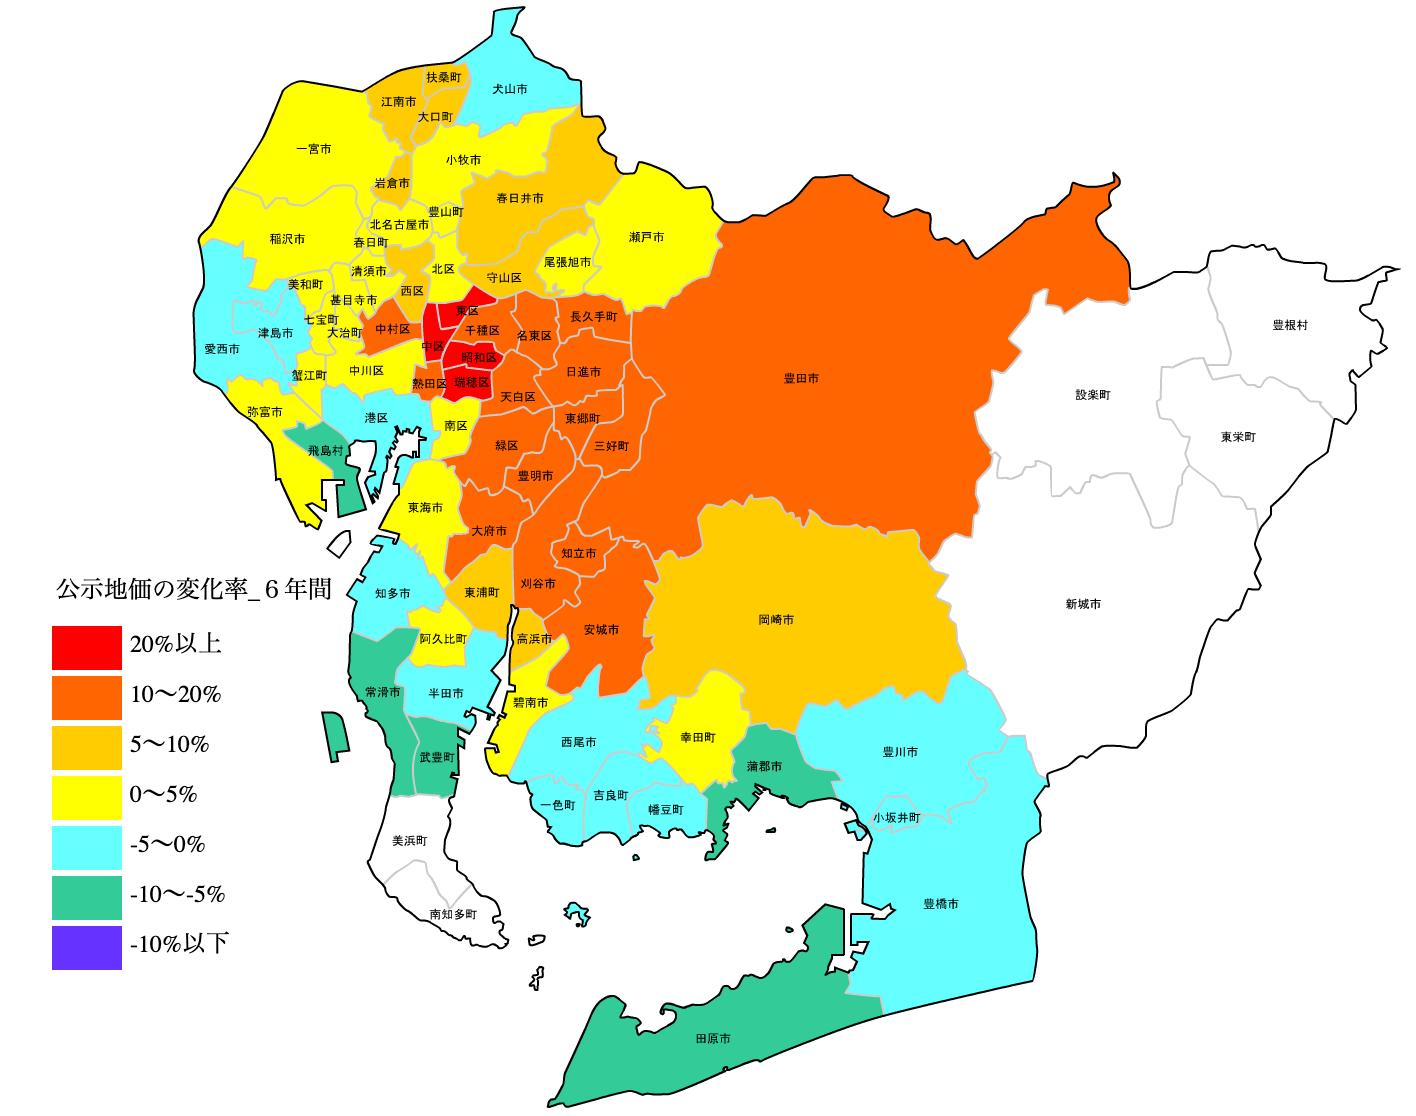 愛知県の公示地価の変化率地図 H25-H31